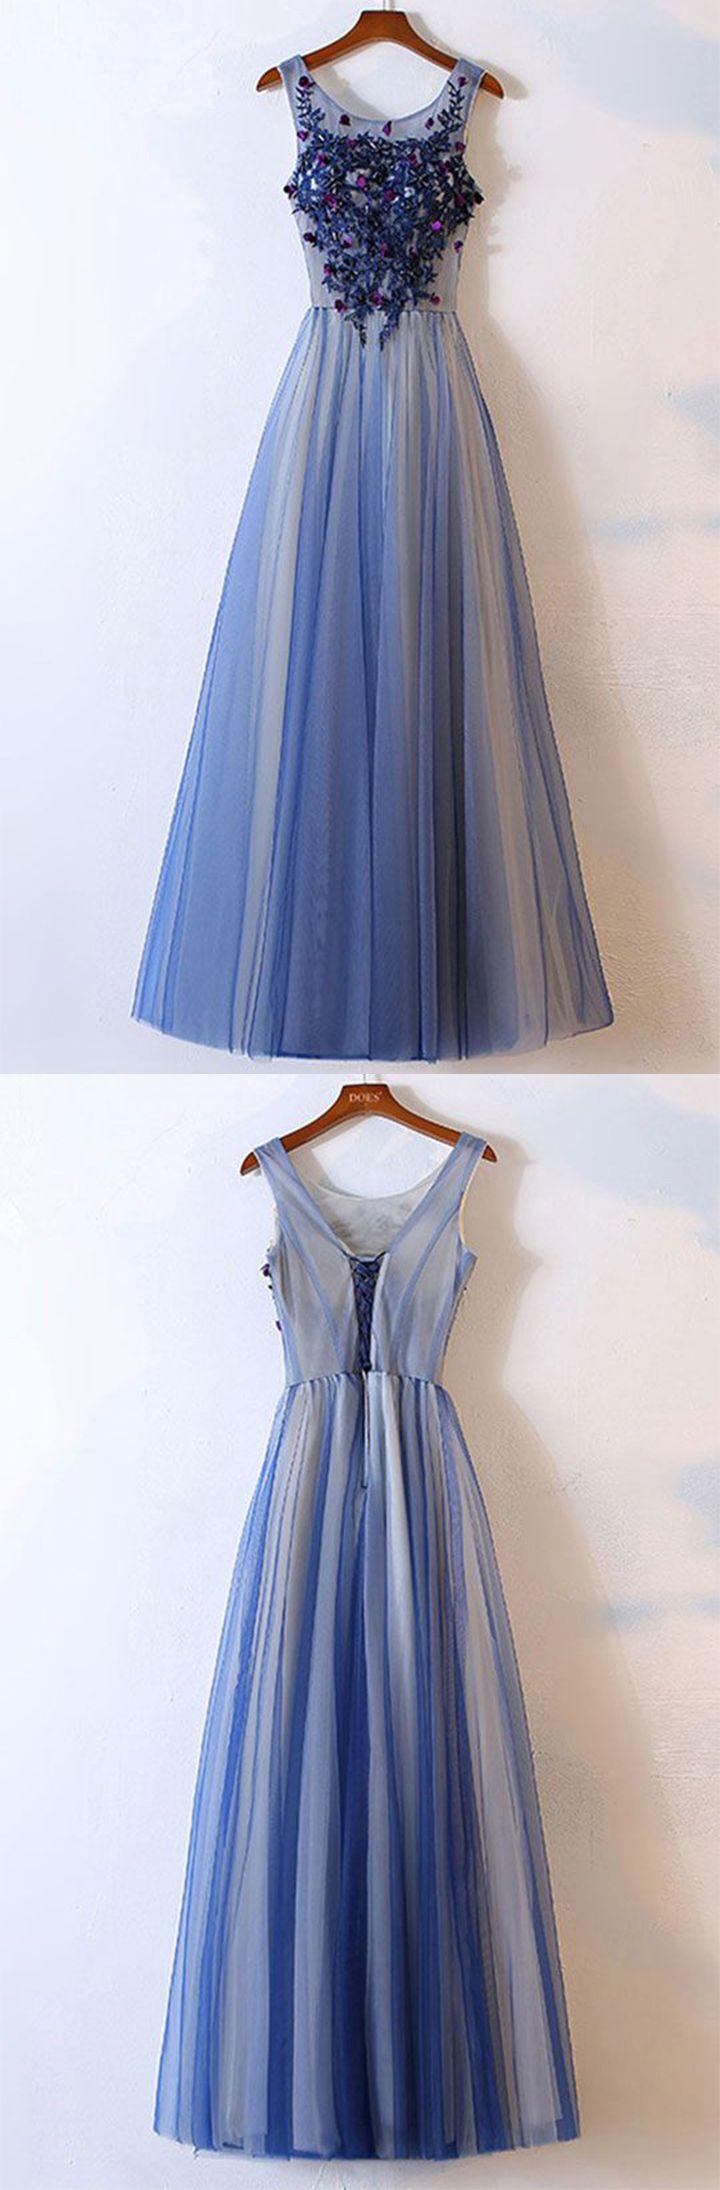 Blue Prom Dress,tulle Prom Dress, round neck Prom Dresses,long prom dresses, tulle evening dress,Appliqued Prom Dress,A Line Prom Gowns,Prom Dresses